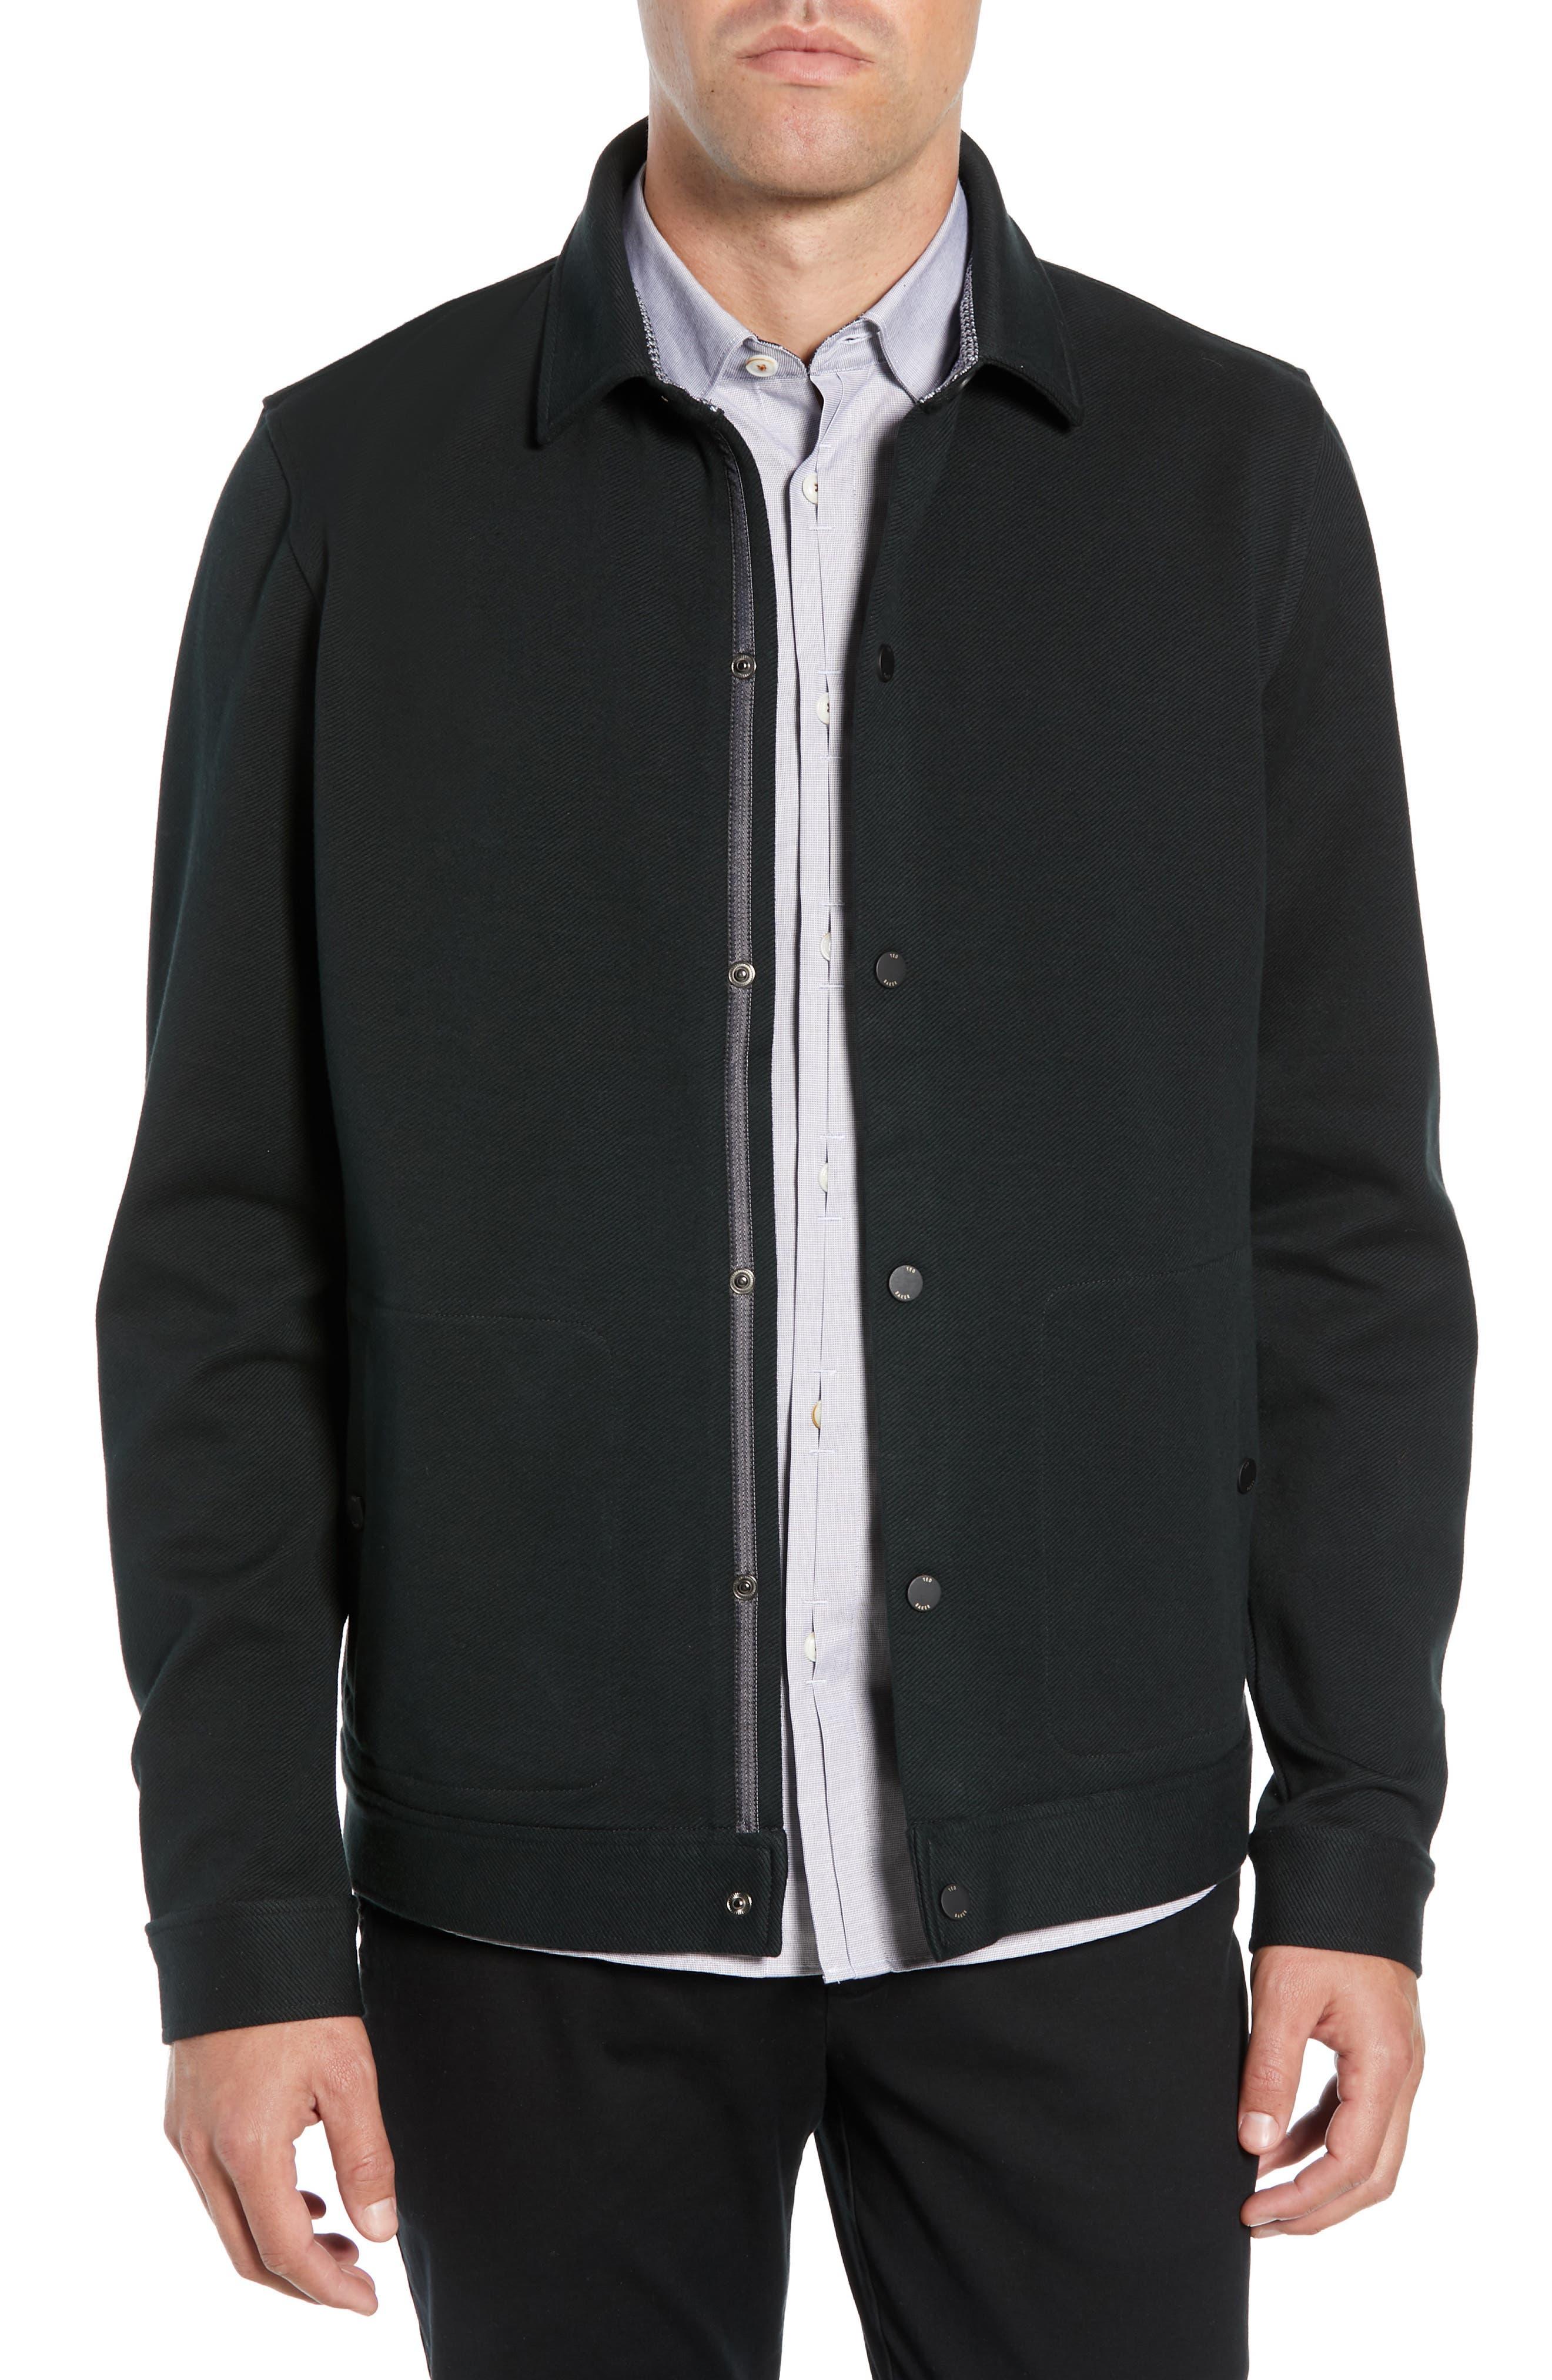 Danett Tall Twill Jacket,                             Main thumbnail 1, color,                             BLACK